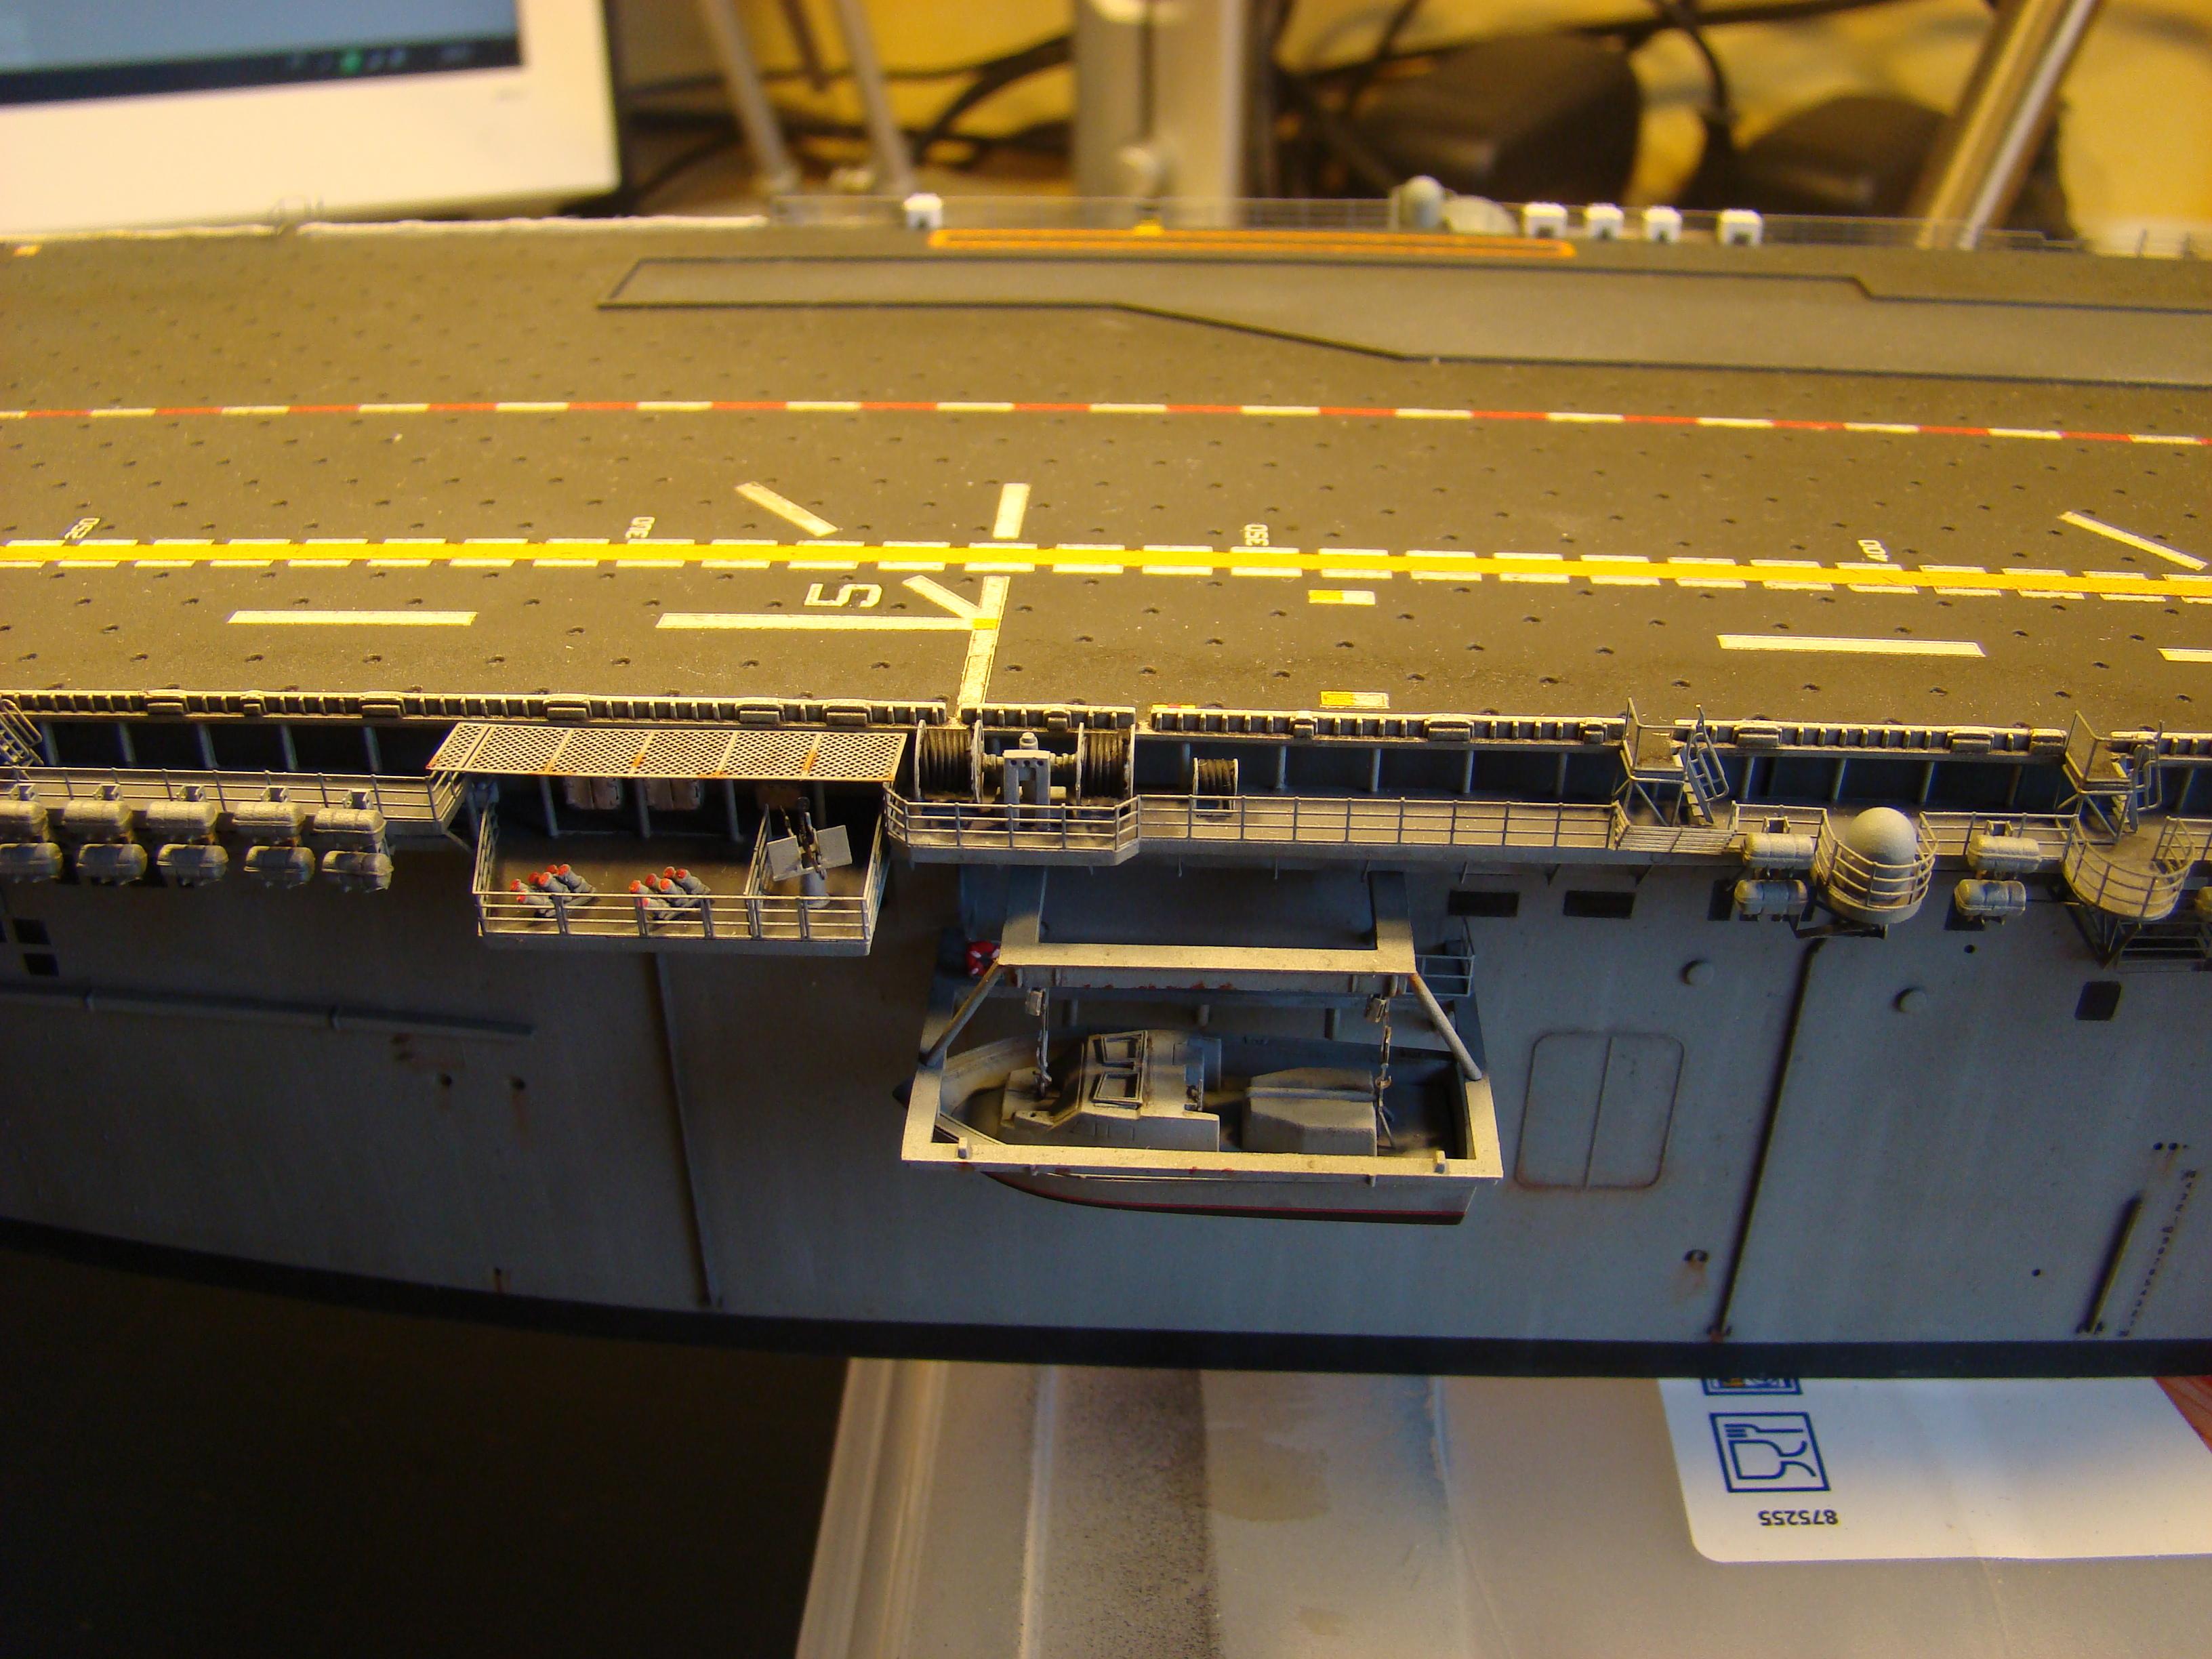 USS WASP LHD-1 au 1/350ème - Page 3 Dsc09105n